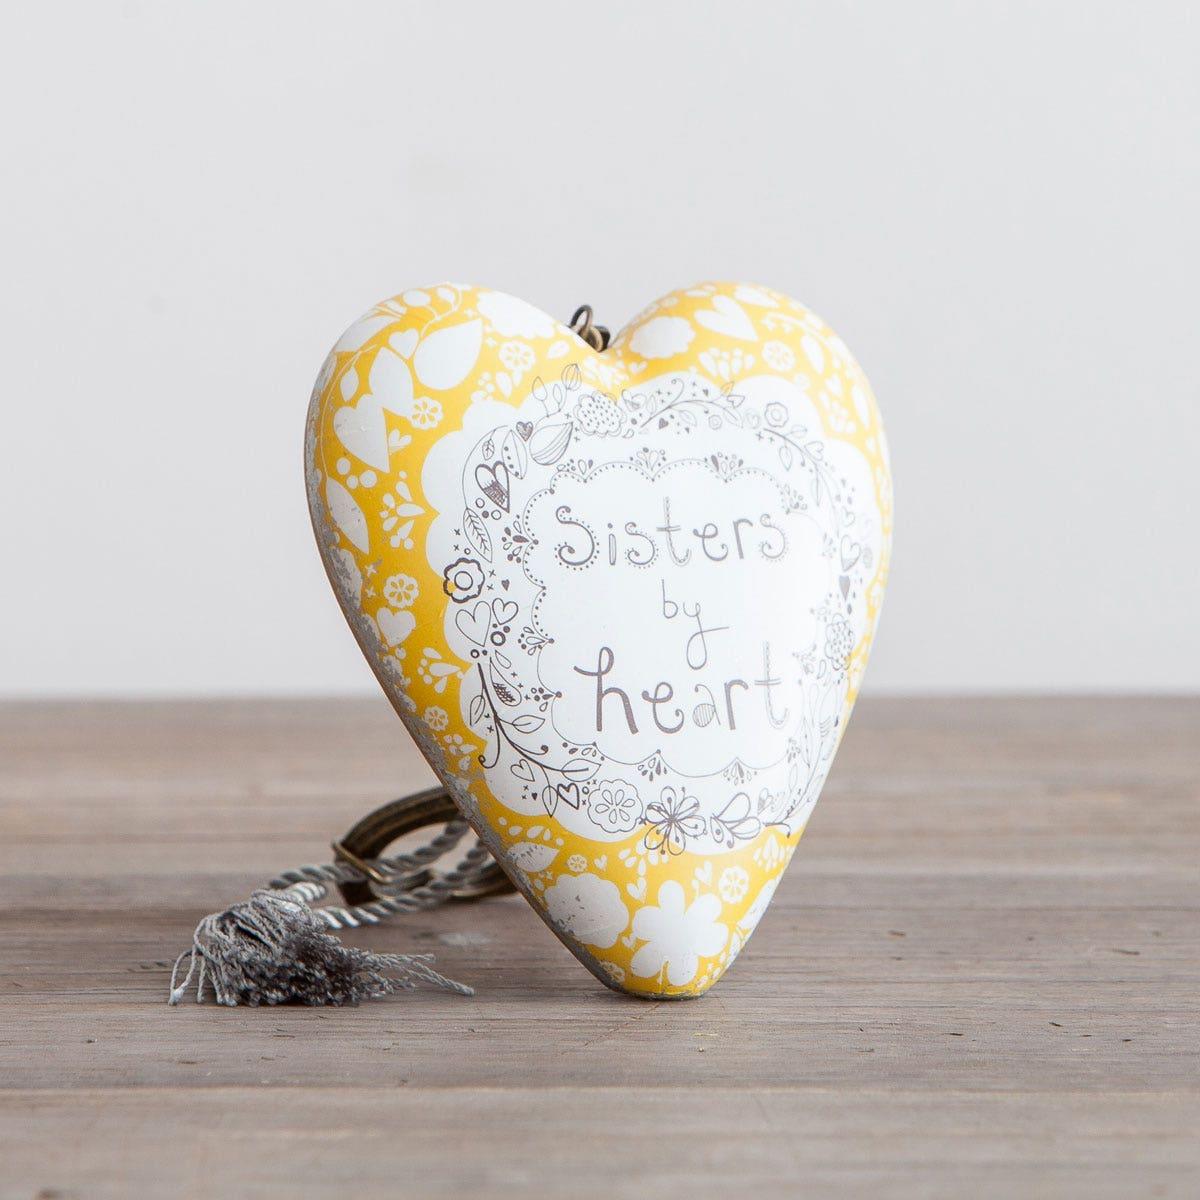 Sisters by Heart - Art Heart Sculpture